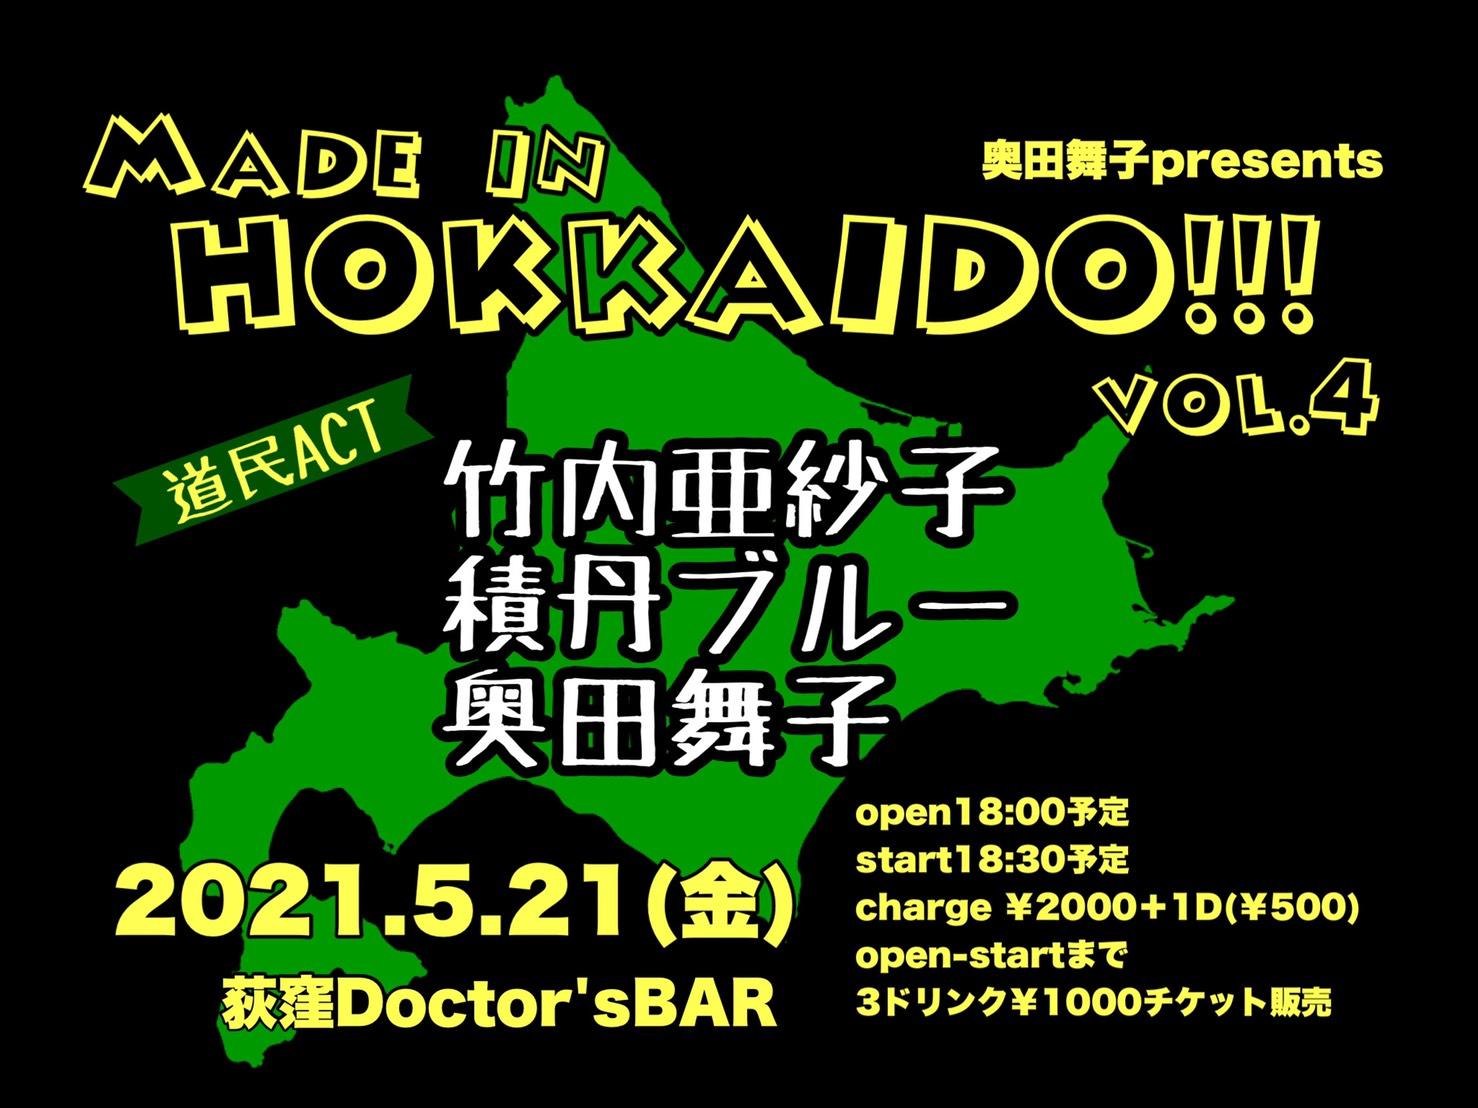 "<span class=""title"">※時間変更あり 2021年5月21日(金)荻窪Doctor'sBAR(東京都)</span>"